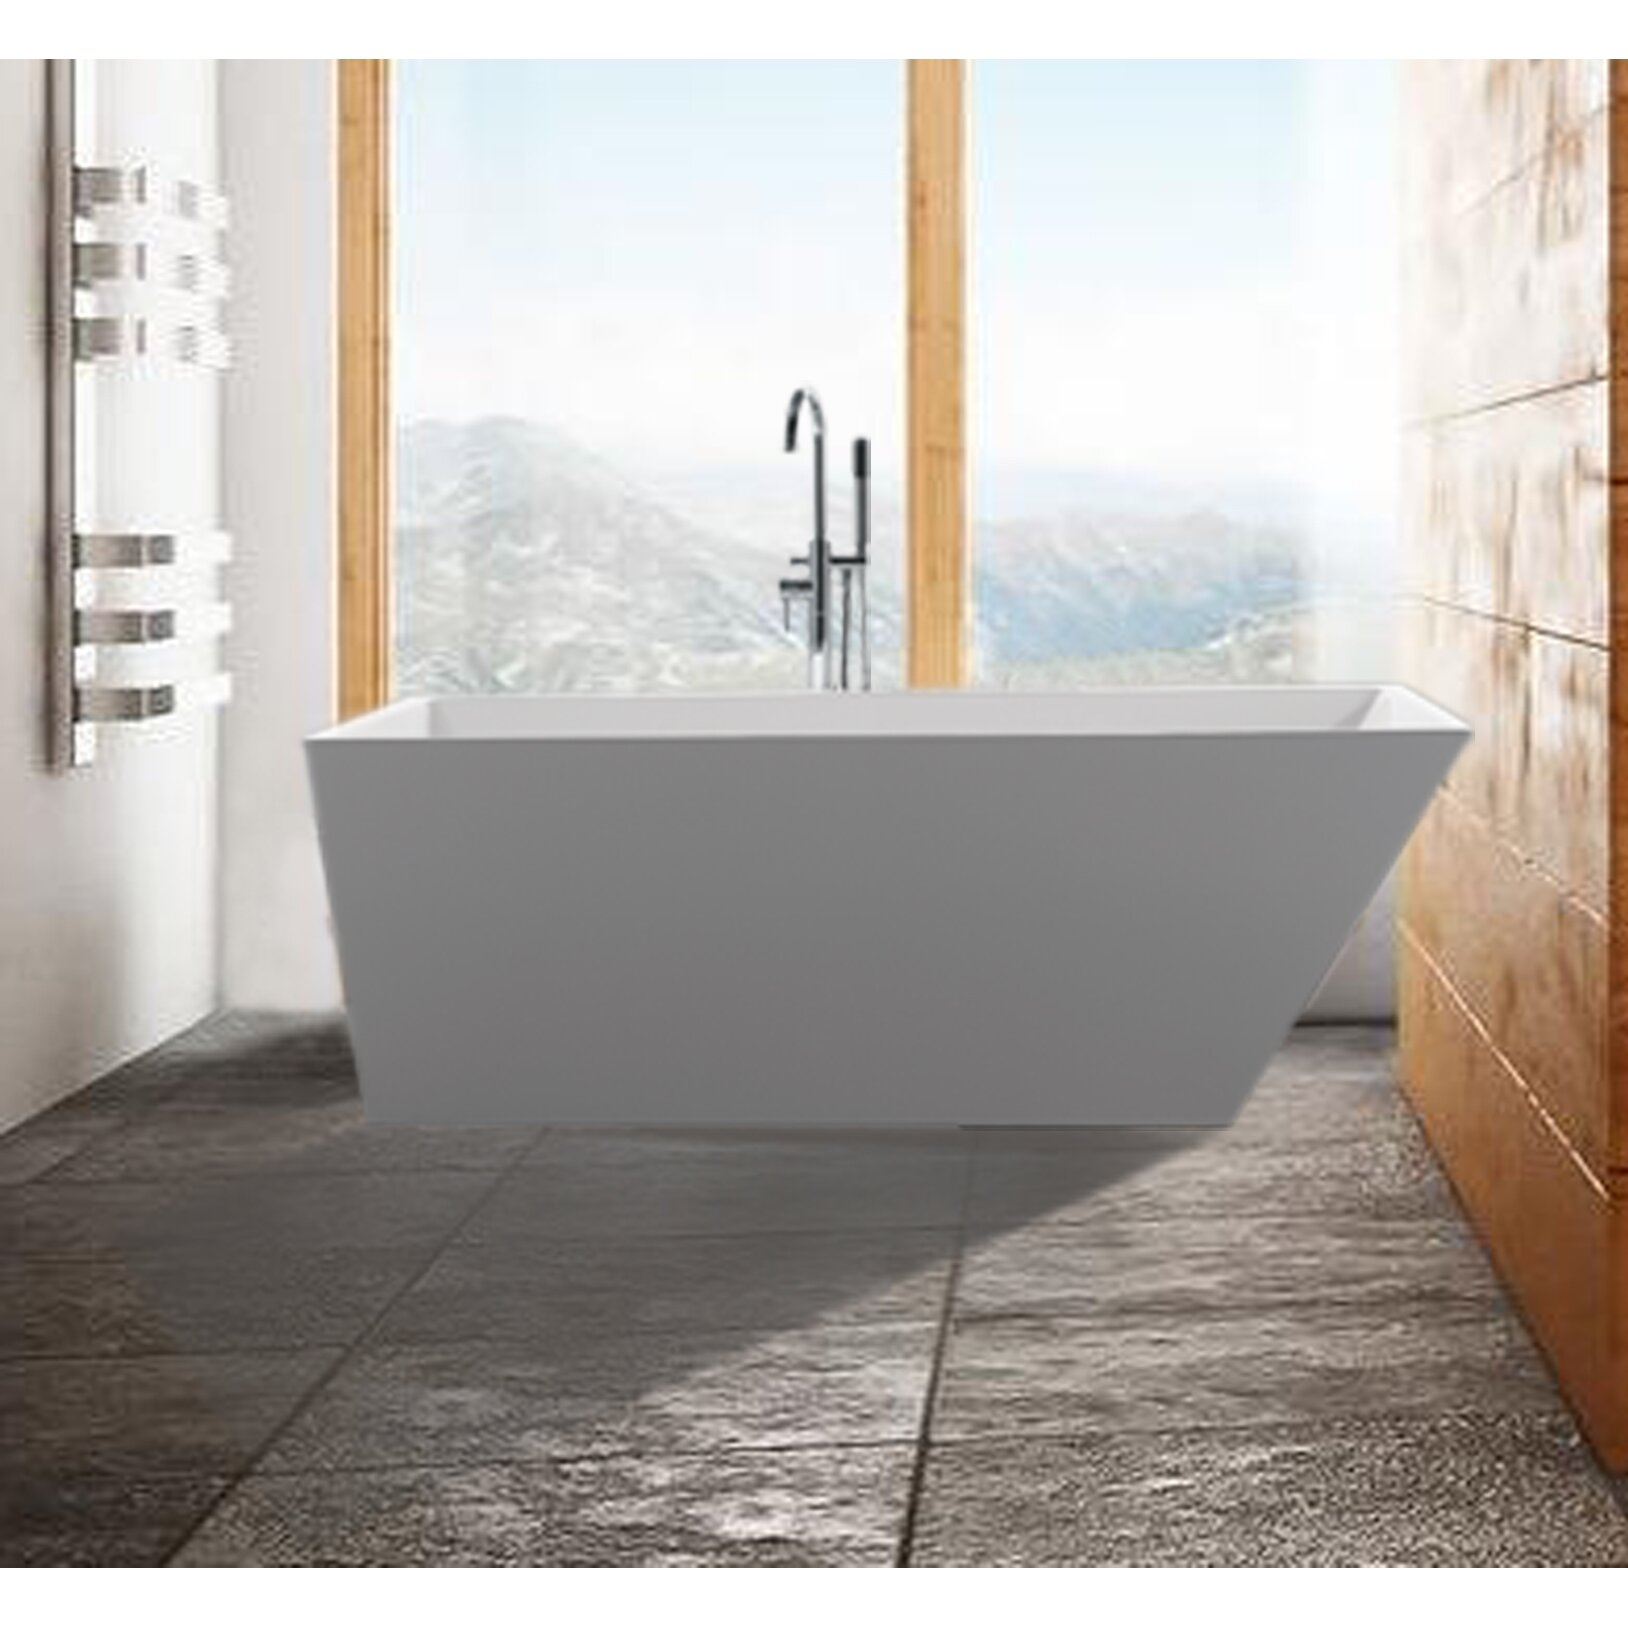 Malta Scarlet  X  Soaking Bathtub  Reviews Wayfair - Freestanding tub end drain